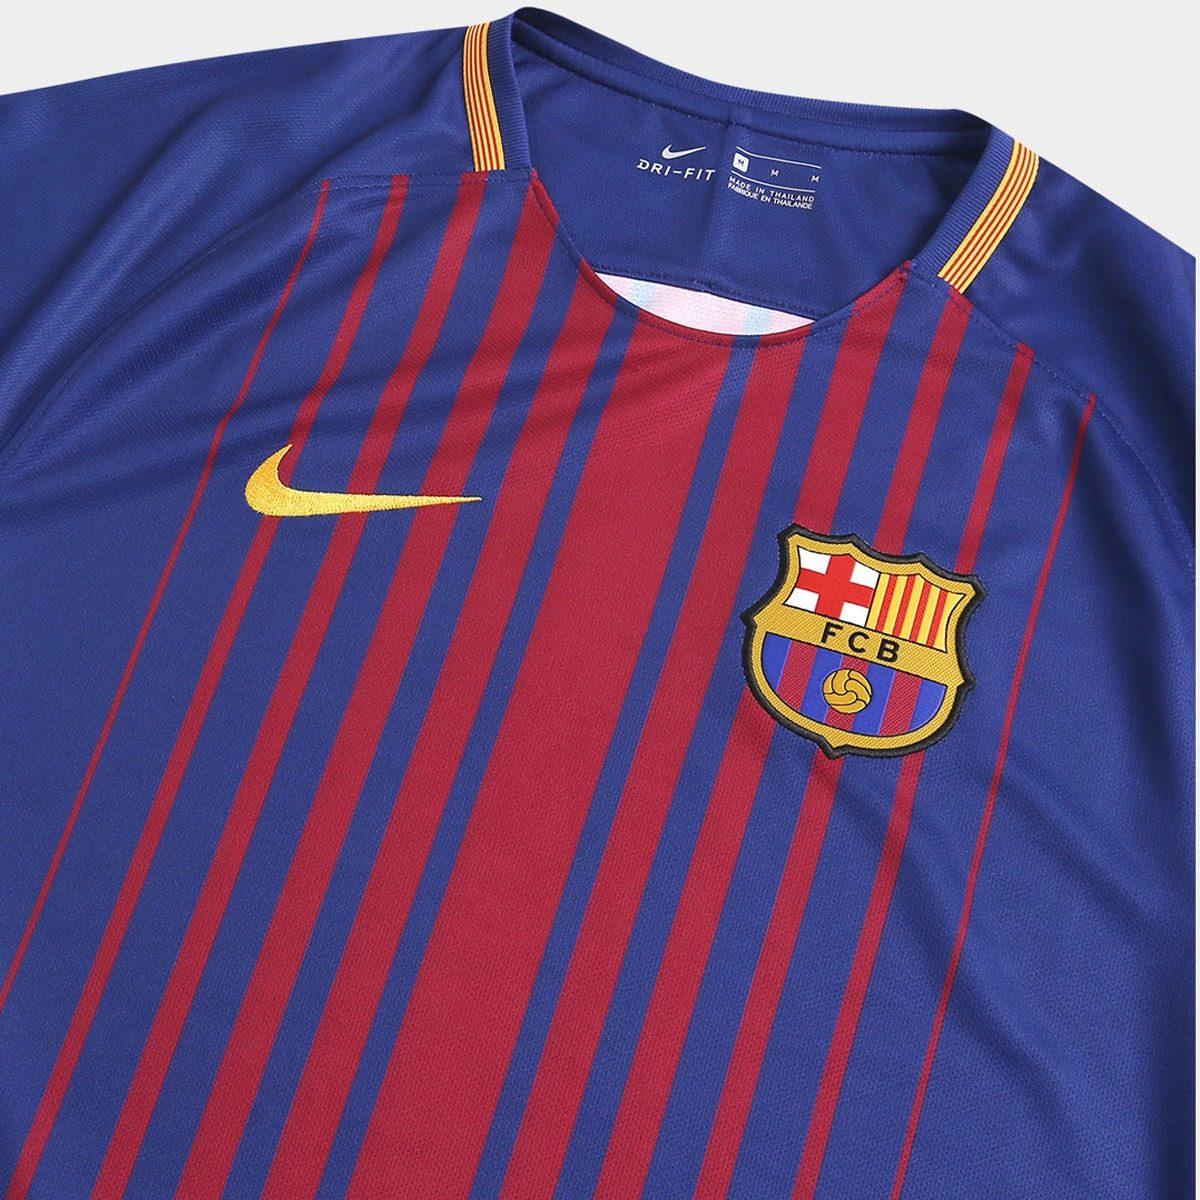 65318d0bcbcd6 camisa barcelona 17 18 messi 10 original. Carregando zoom.